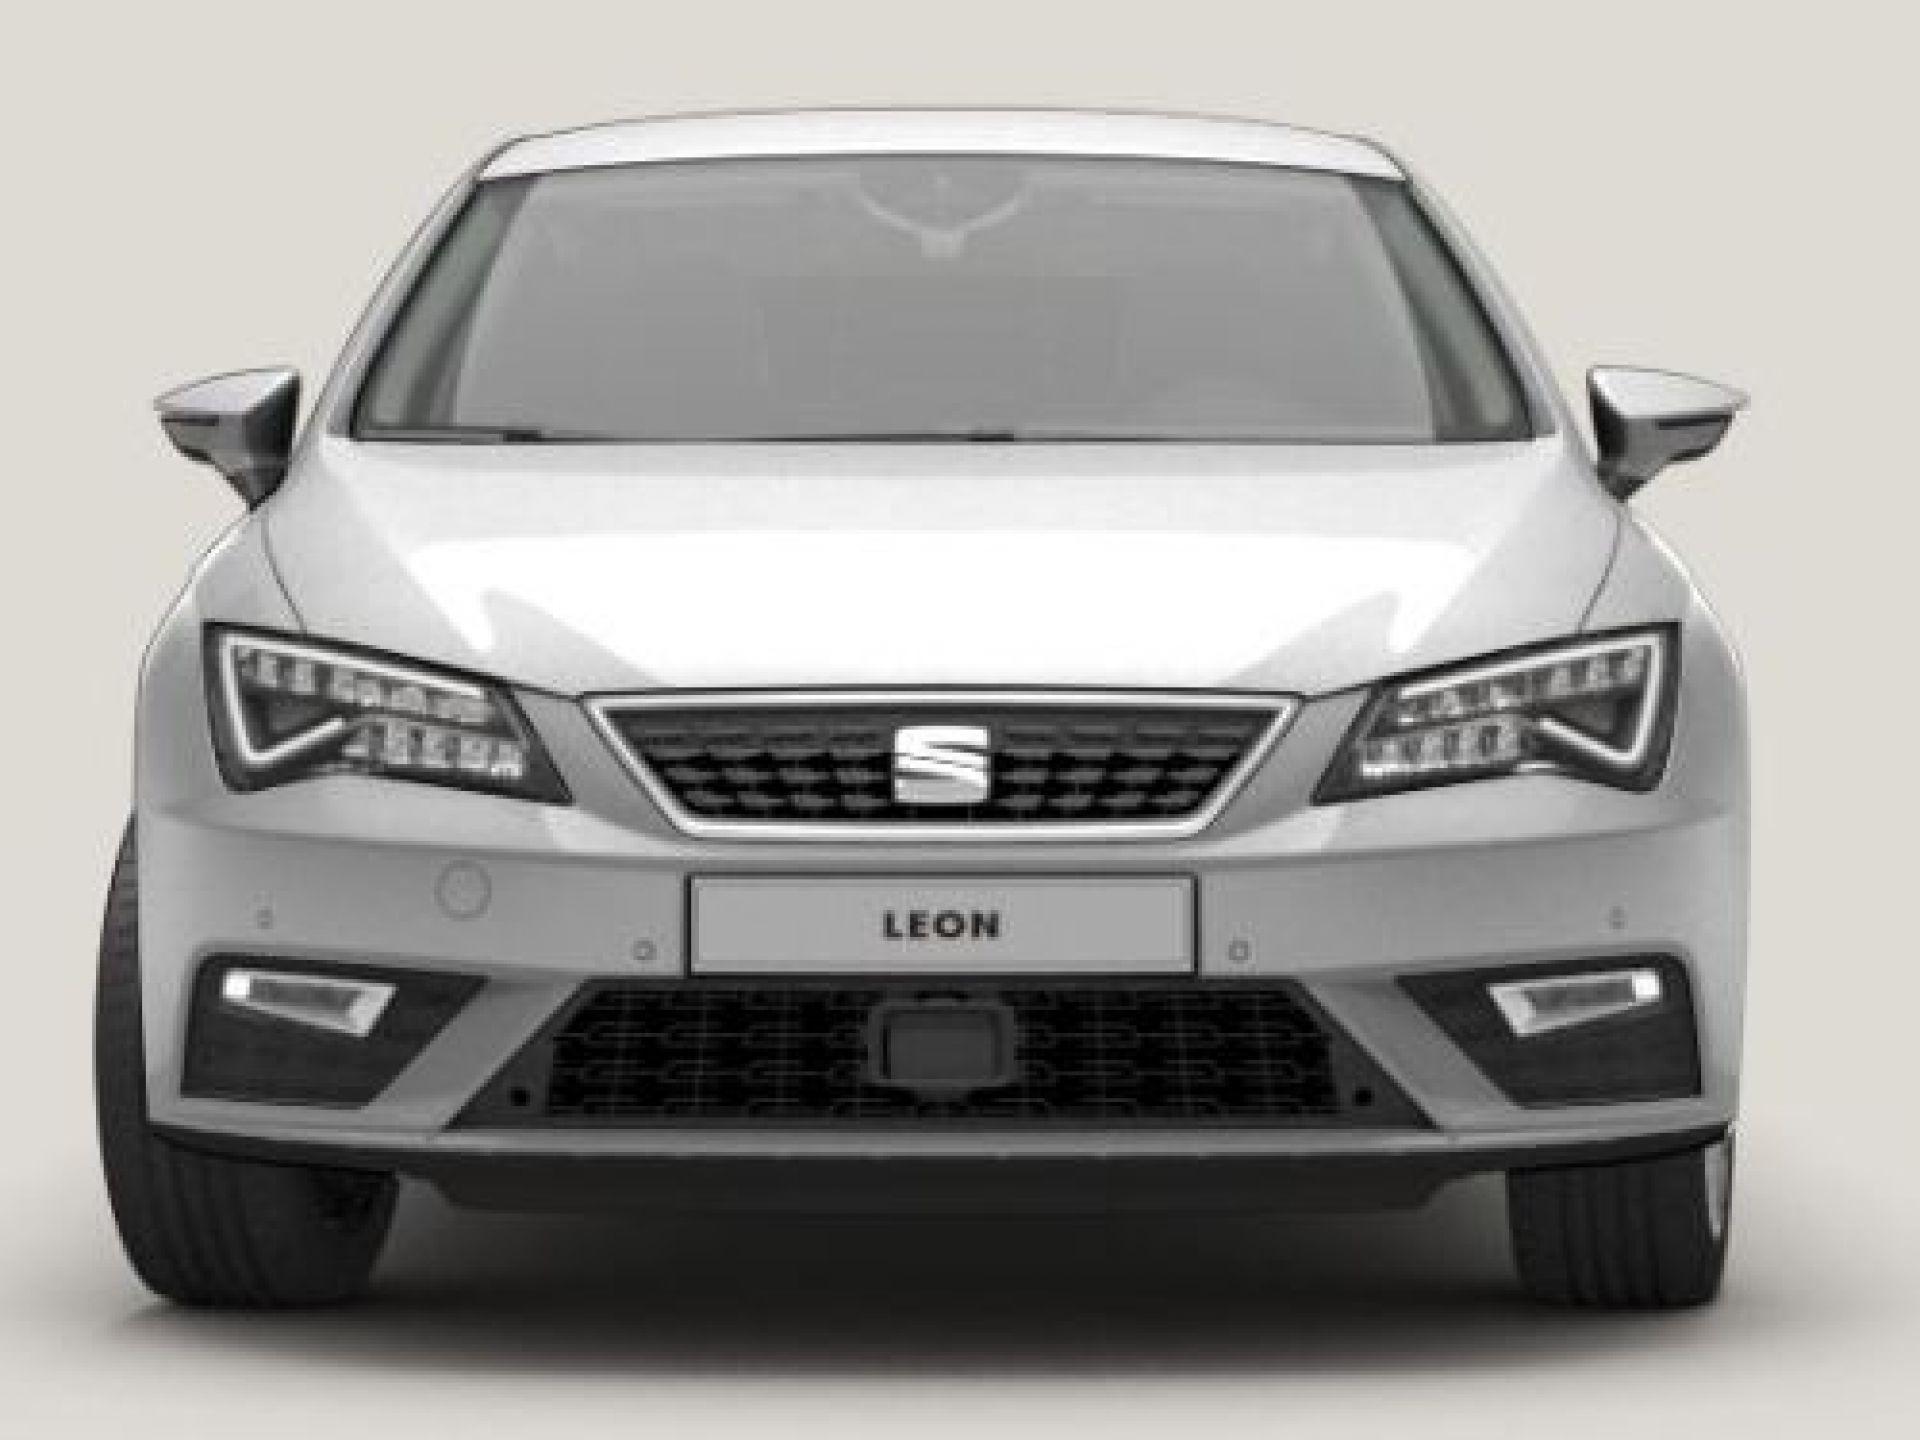 SEAT Leon 1.5 TGI 96kW (130CV) S&S Style Visio Ed nuevo Madrid